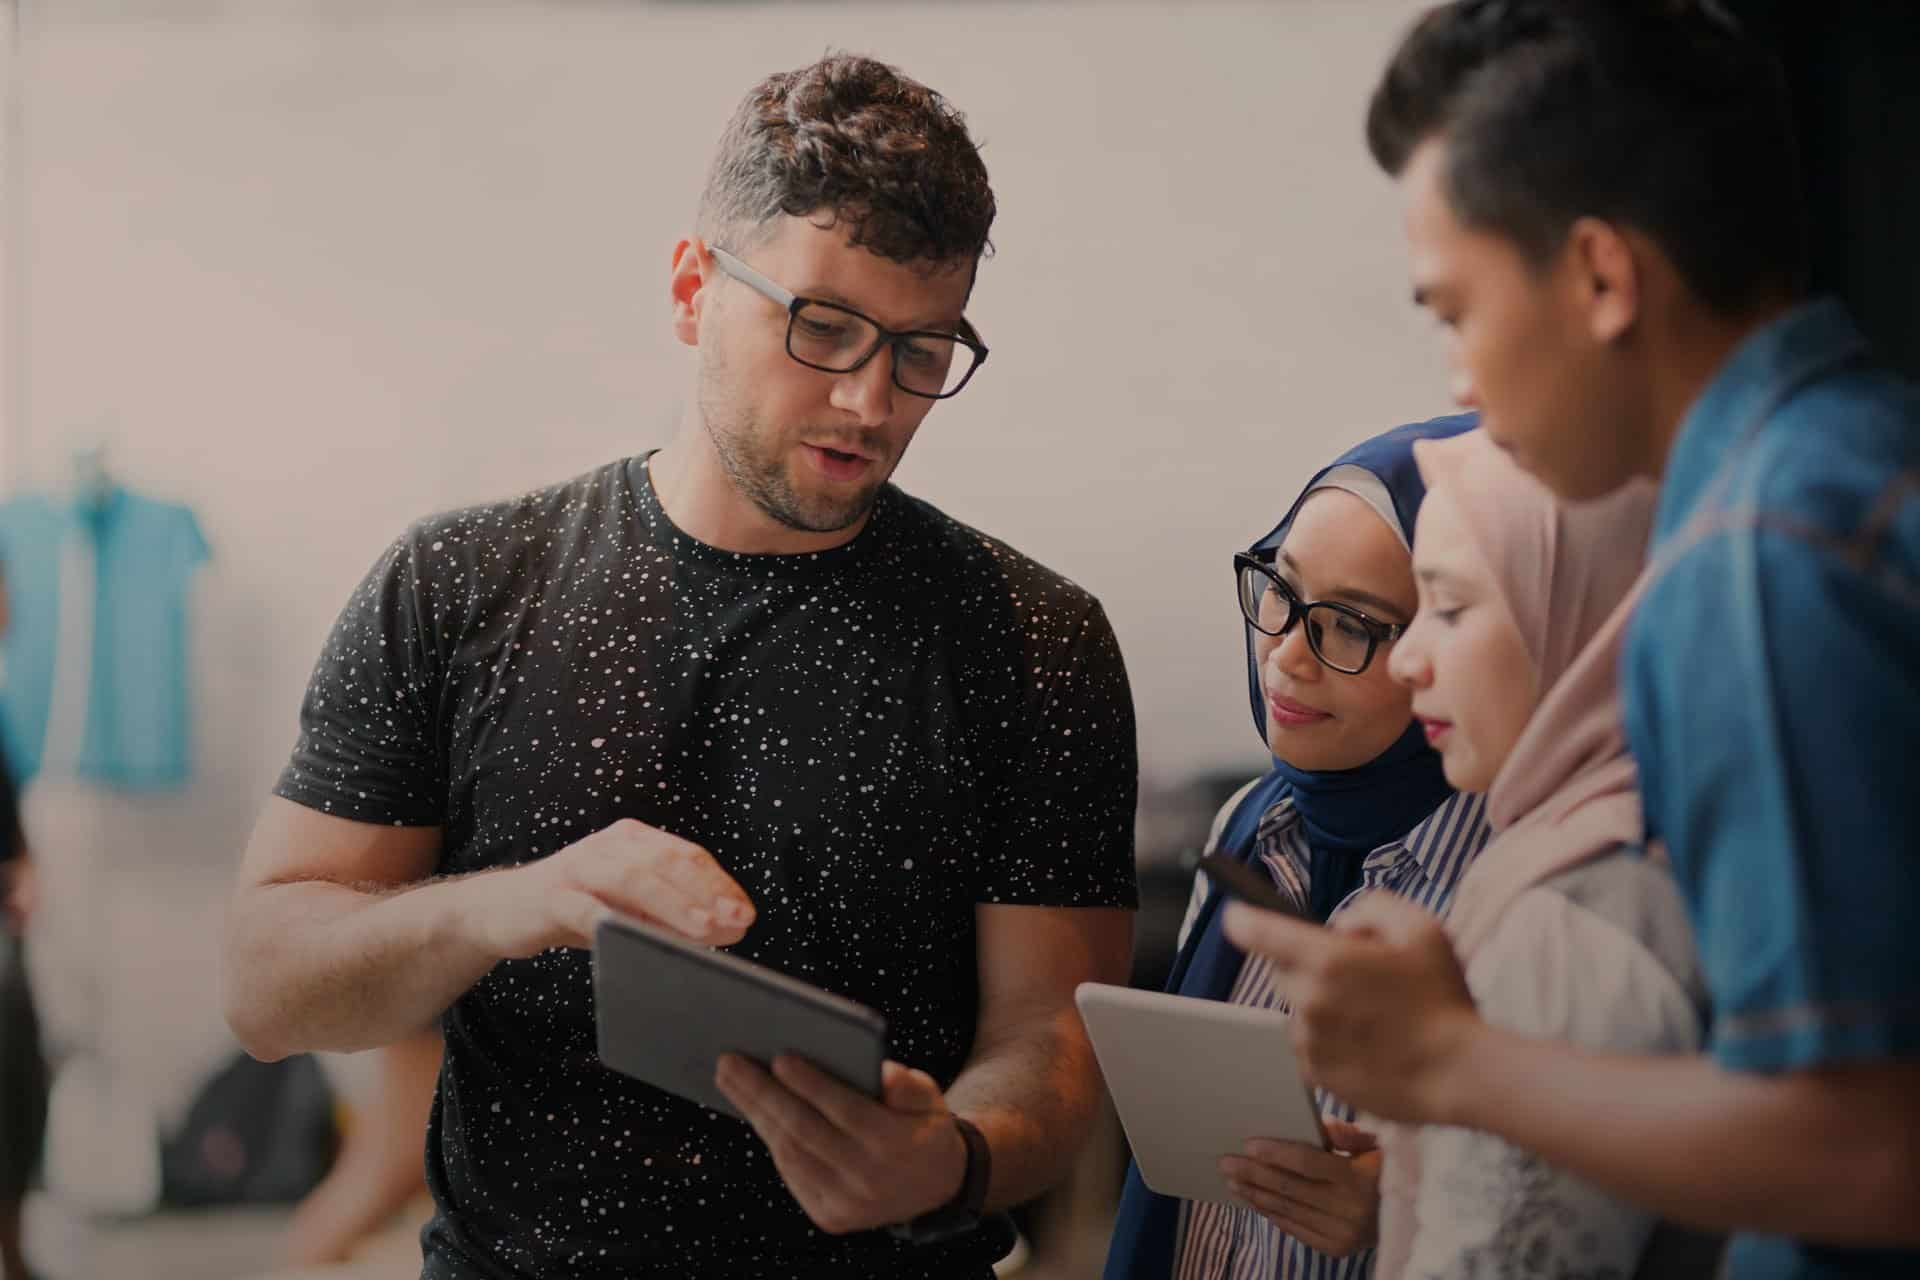 Global business training